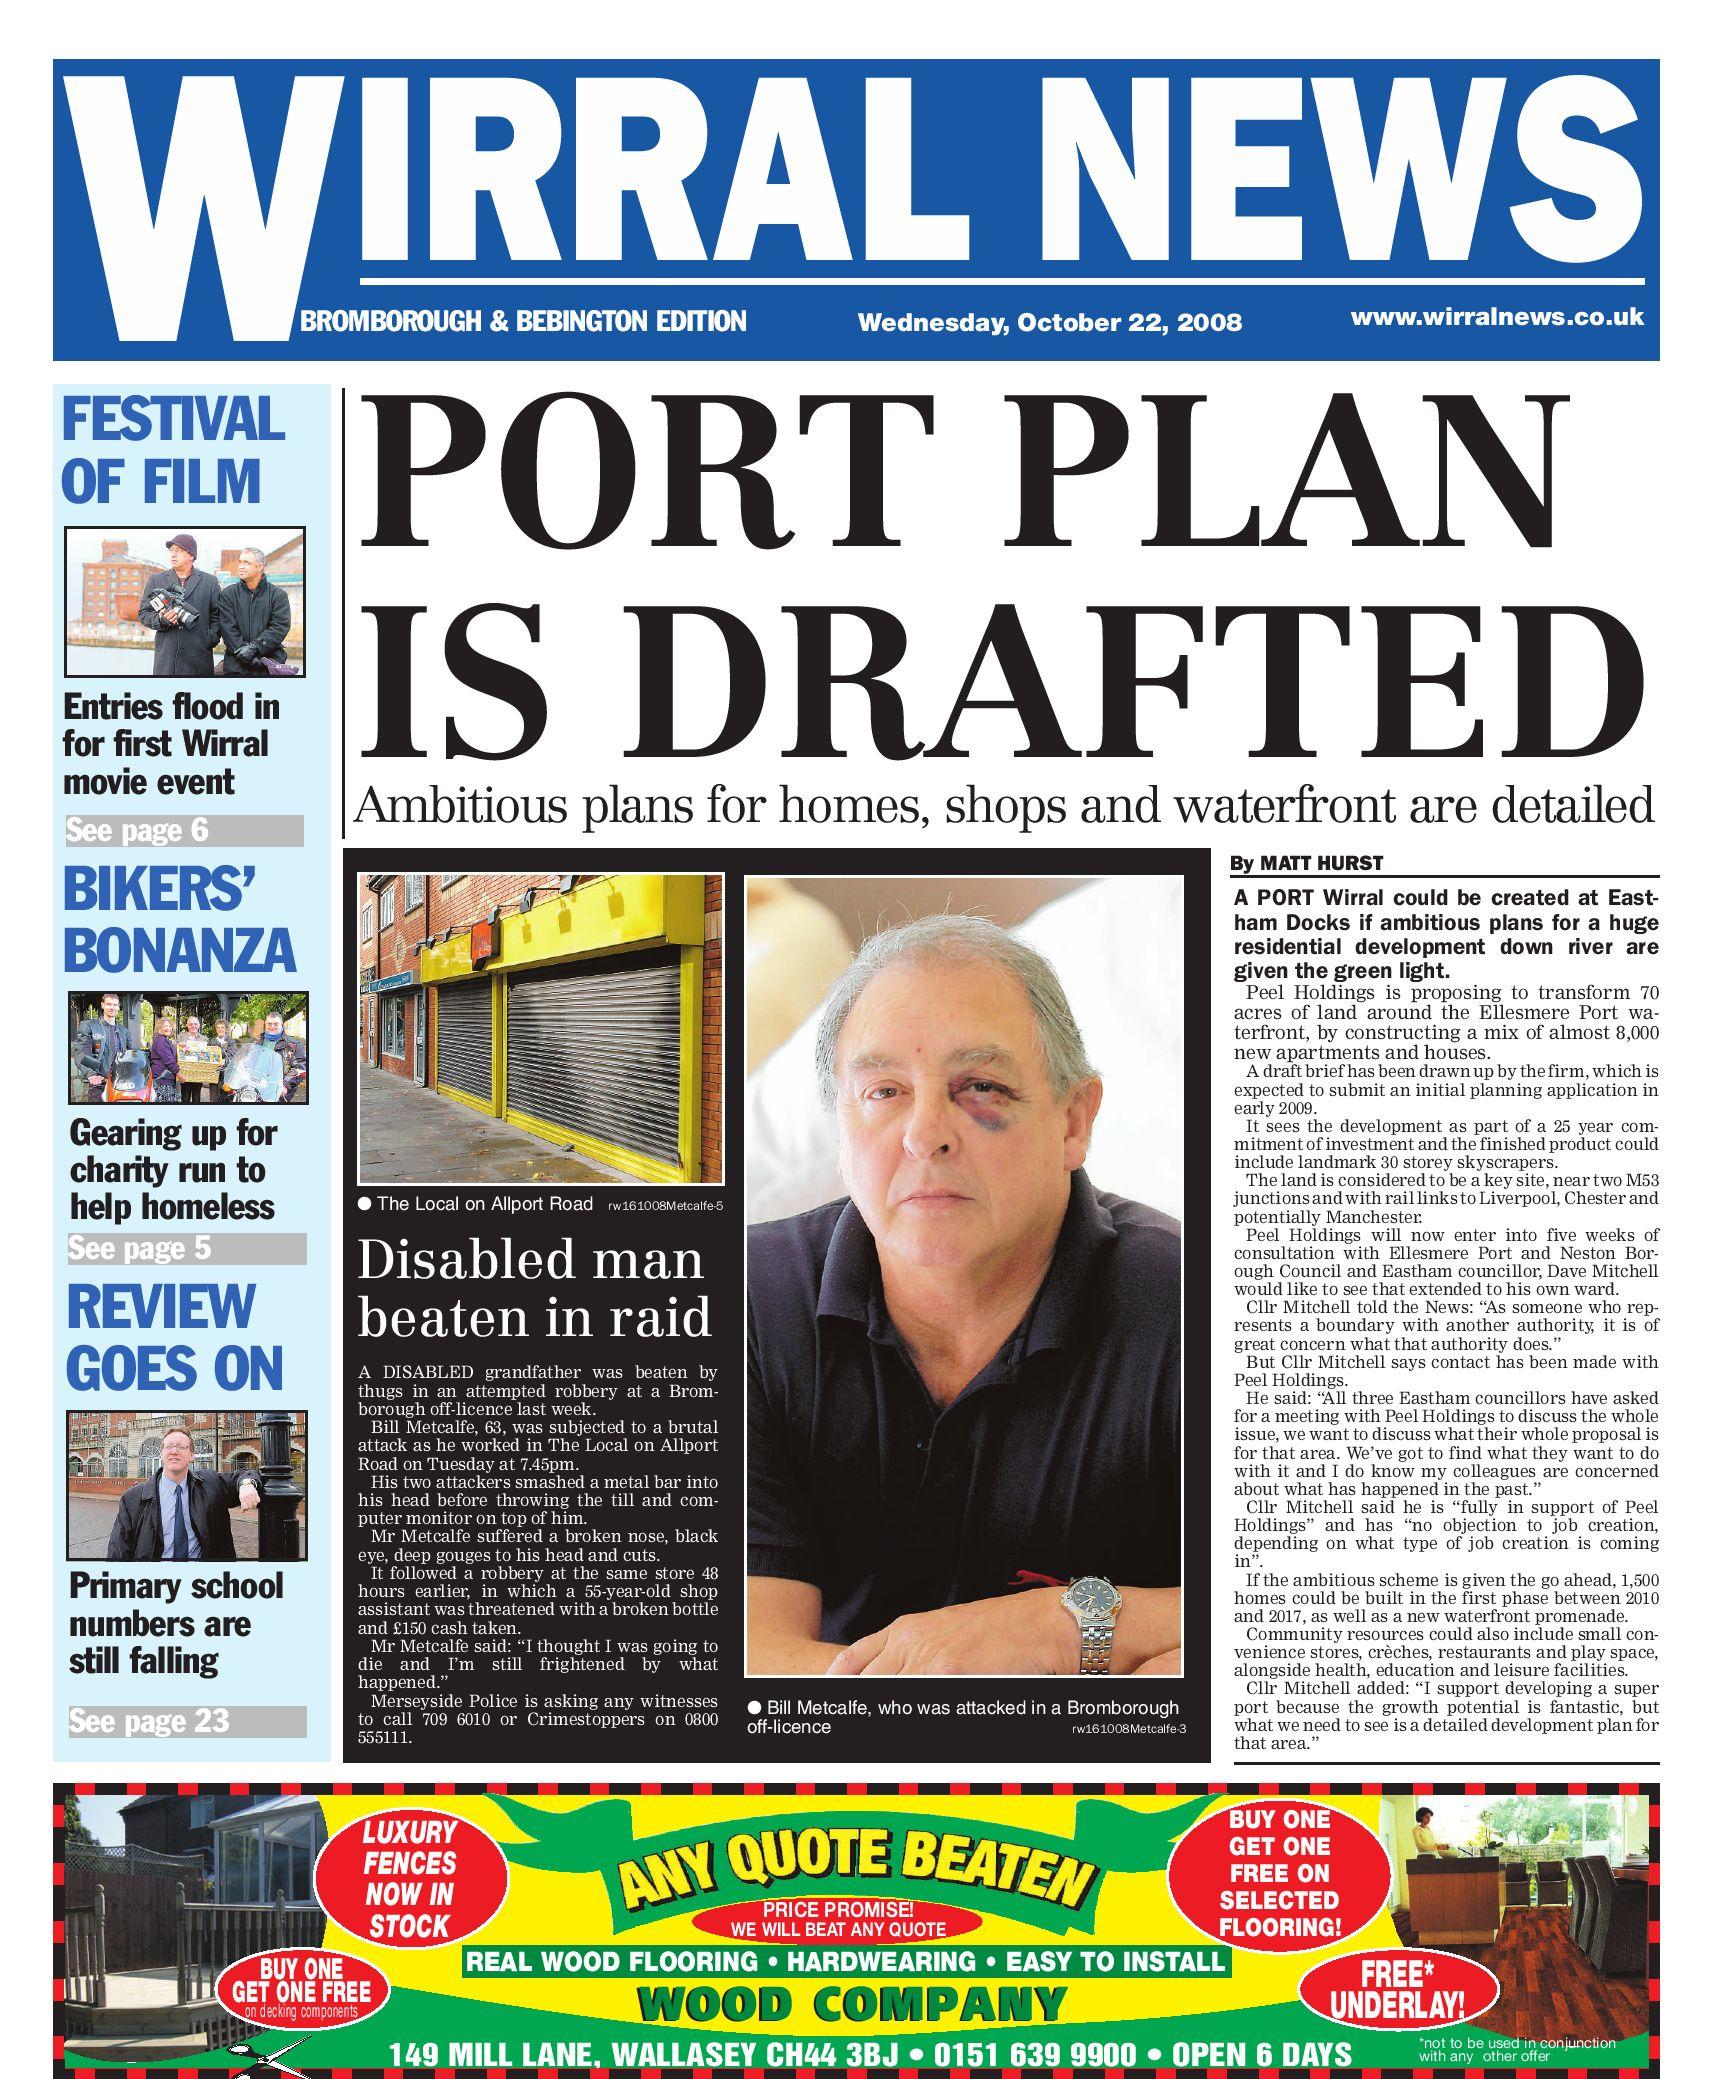 Wirral News - Bromborough & Bebington Edition by Merseyside.Weeklies  v1s1ter - issuu